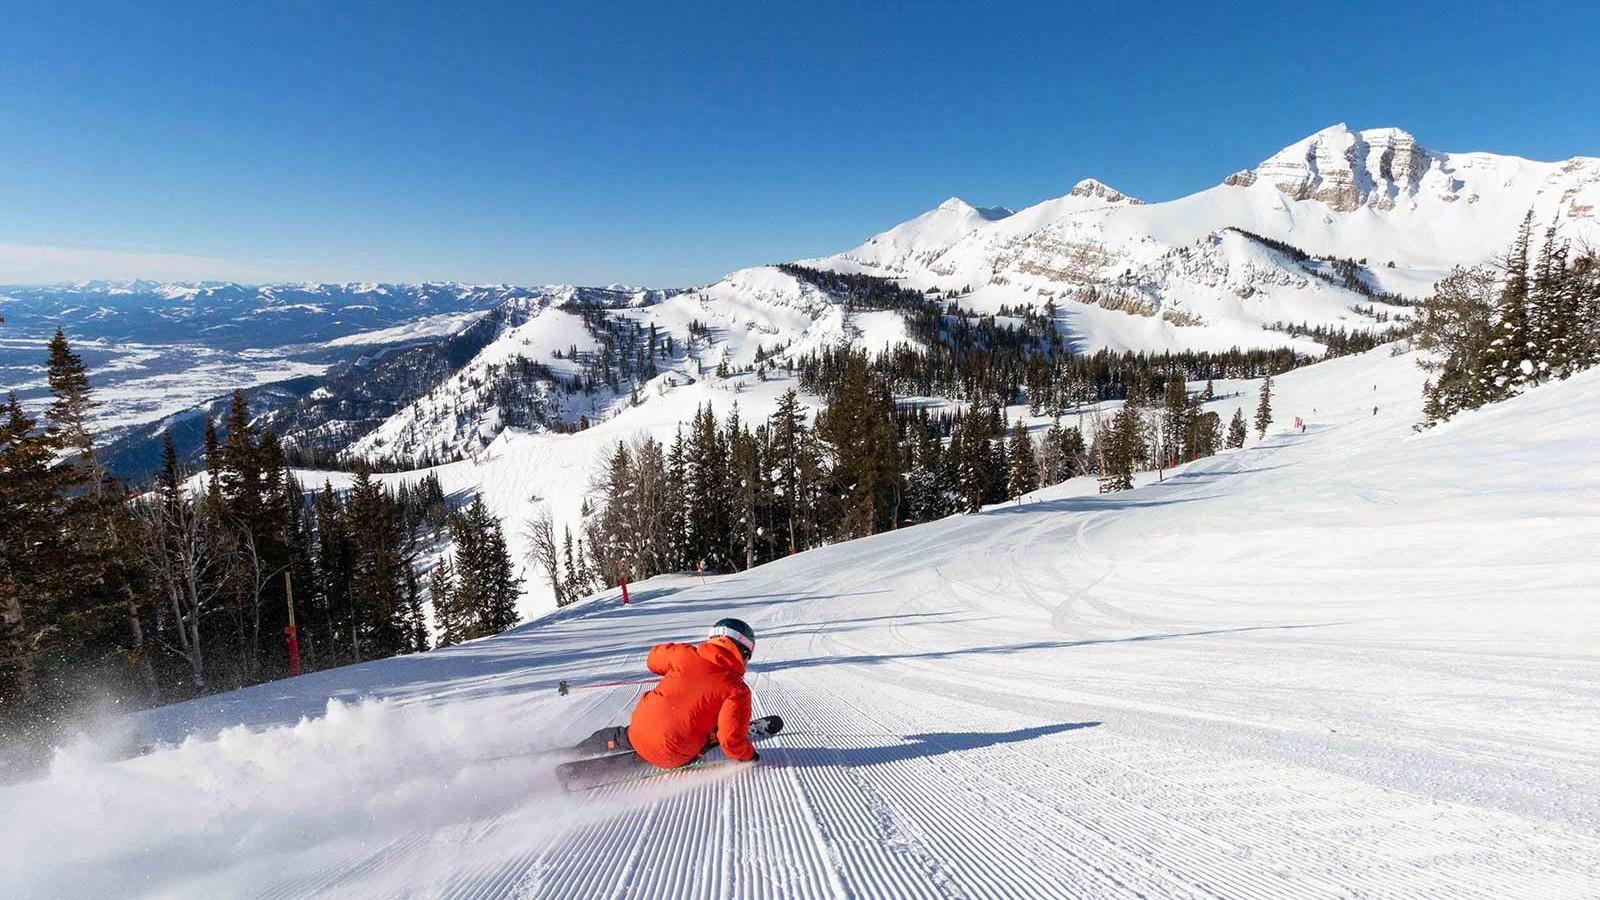 Jackson Hole Ski Resort, USA - Skiing and piste